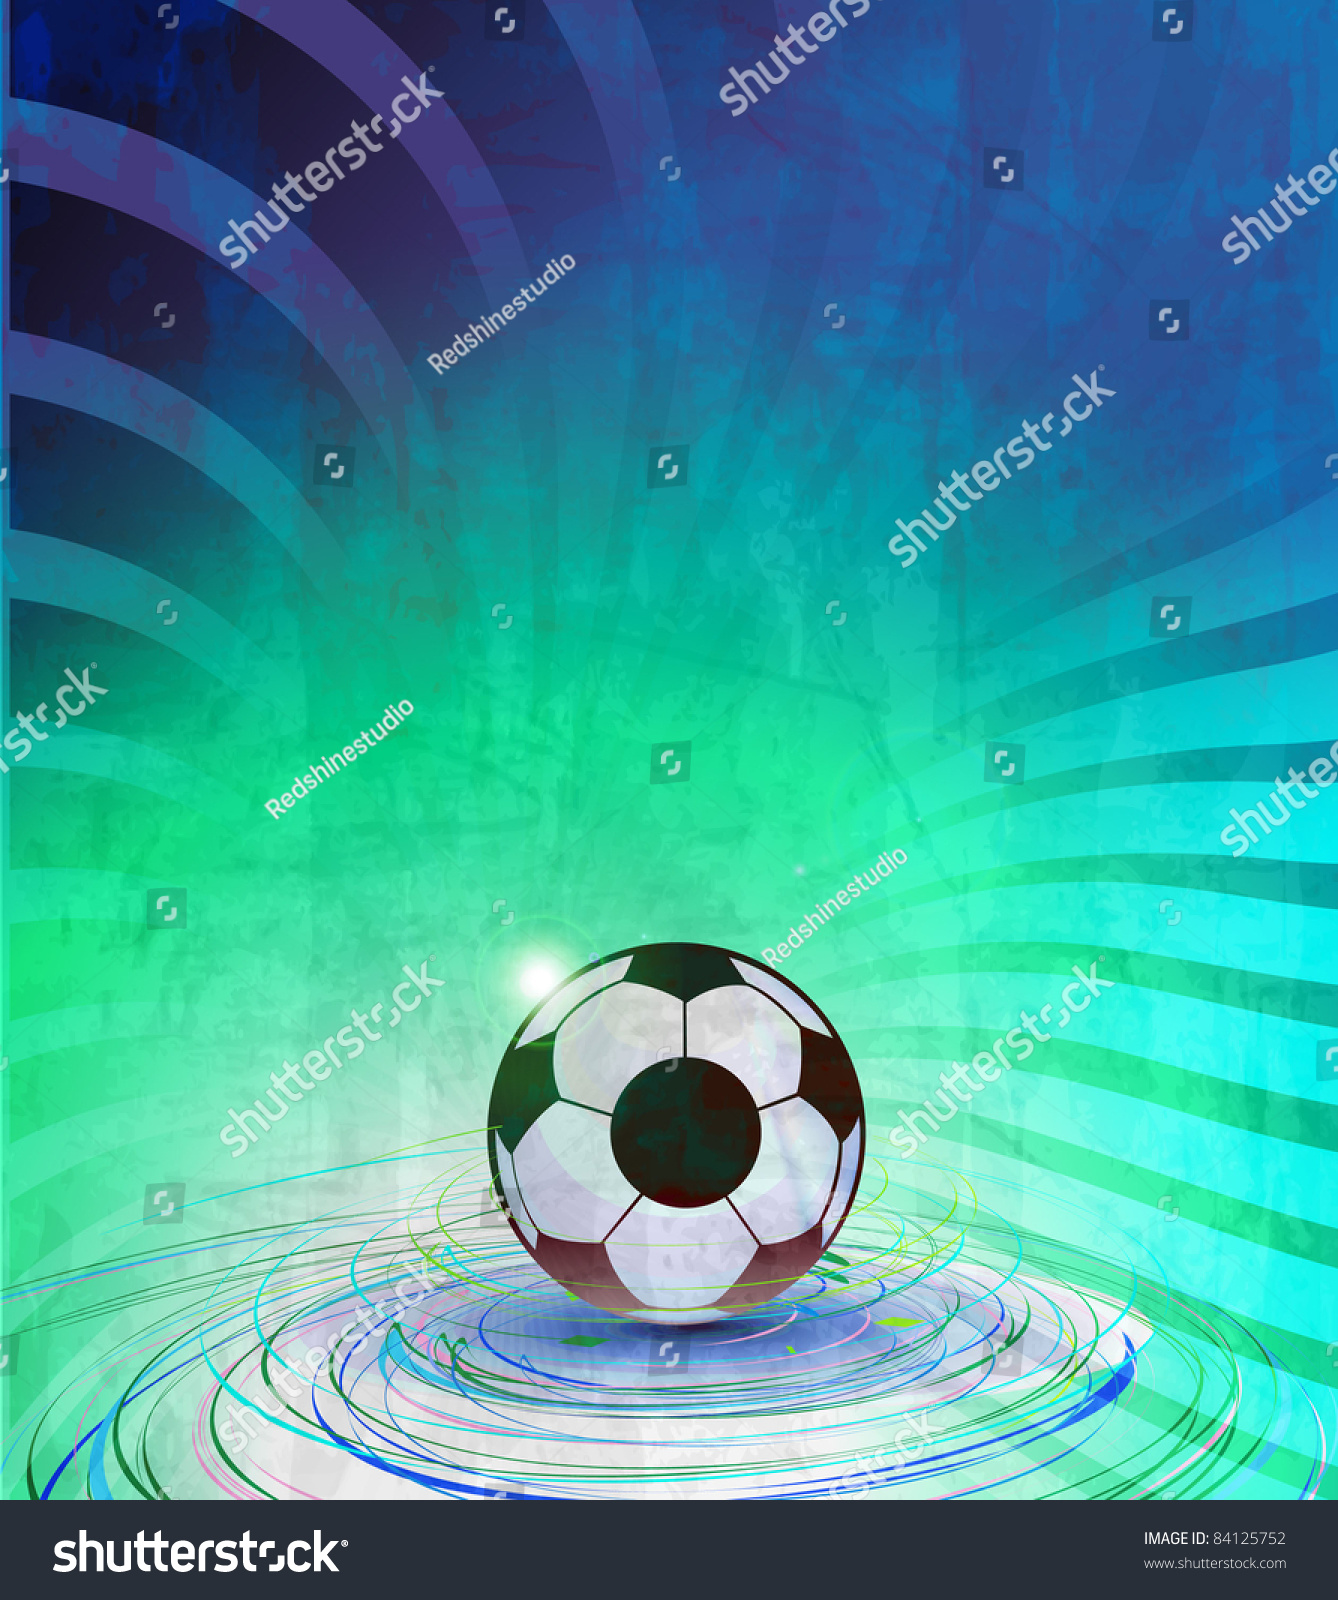 Poster design eps - Football Poster Design Eps10 Vector Background